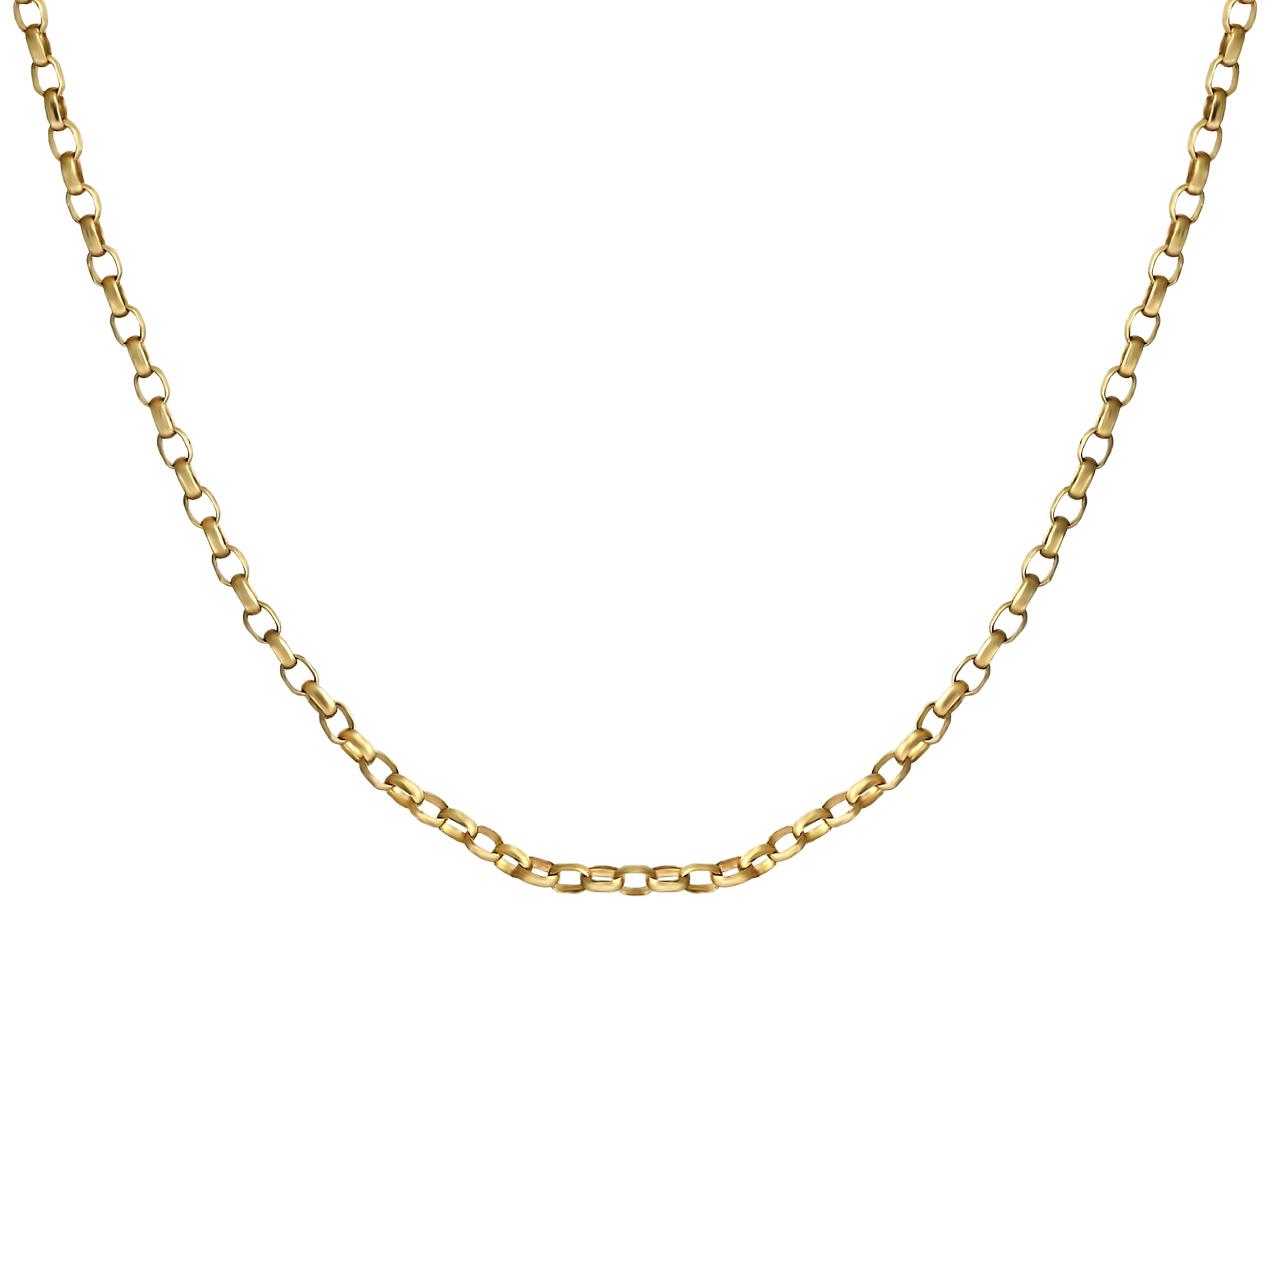 زنجیر طلا 18 عیار زنانه اقلیمه مدل ZT38